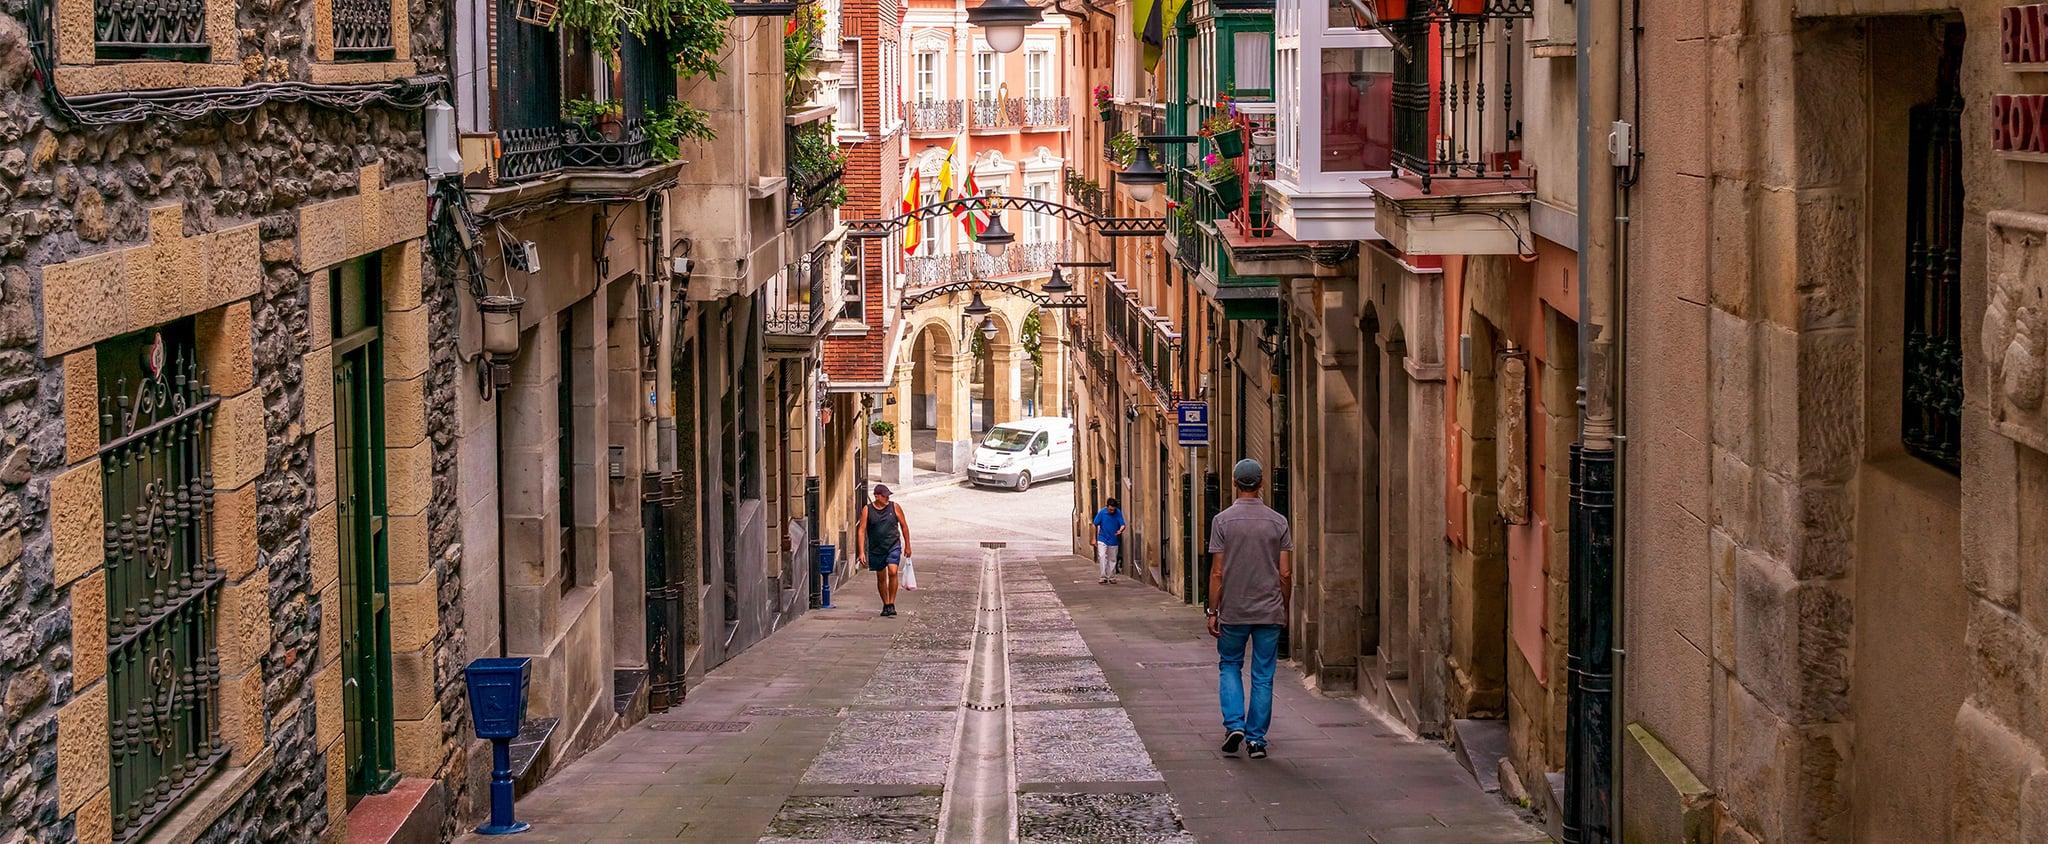 Airbnb تكشف عن قائمتها لأروع الوجهات السياحية لعام 2020